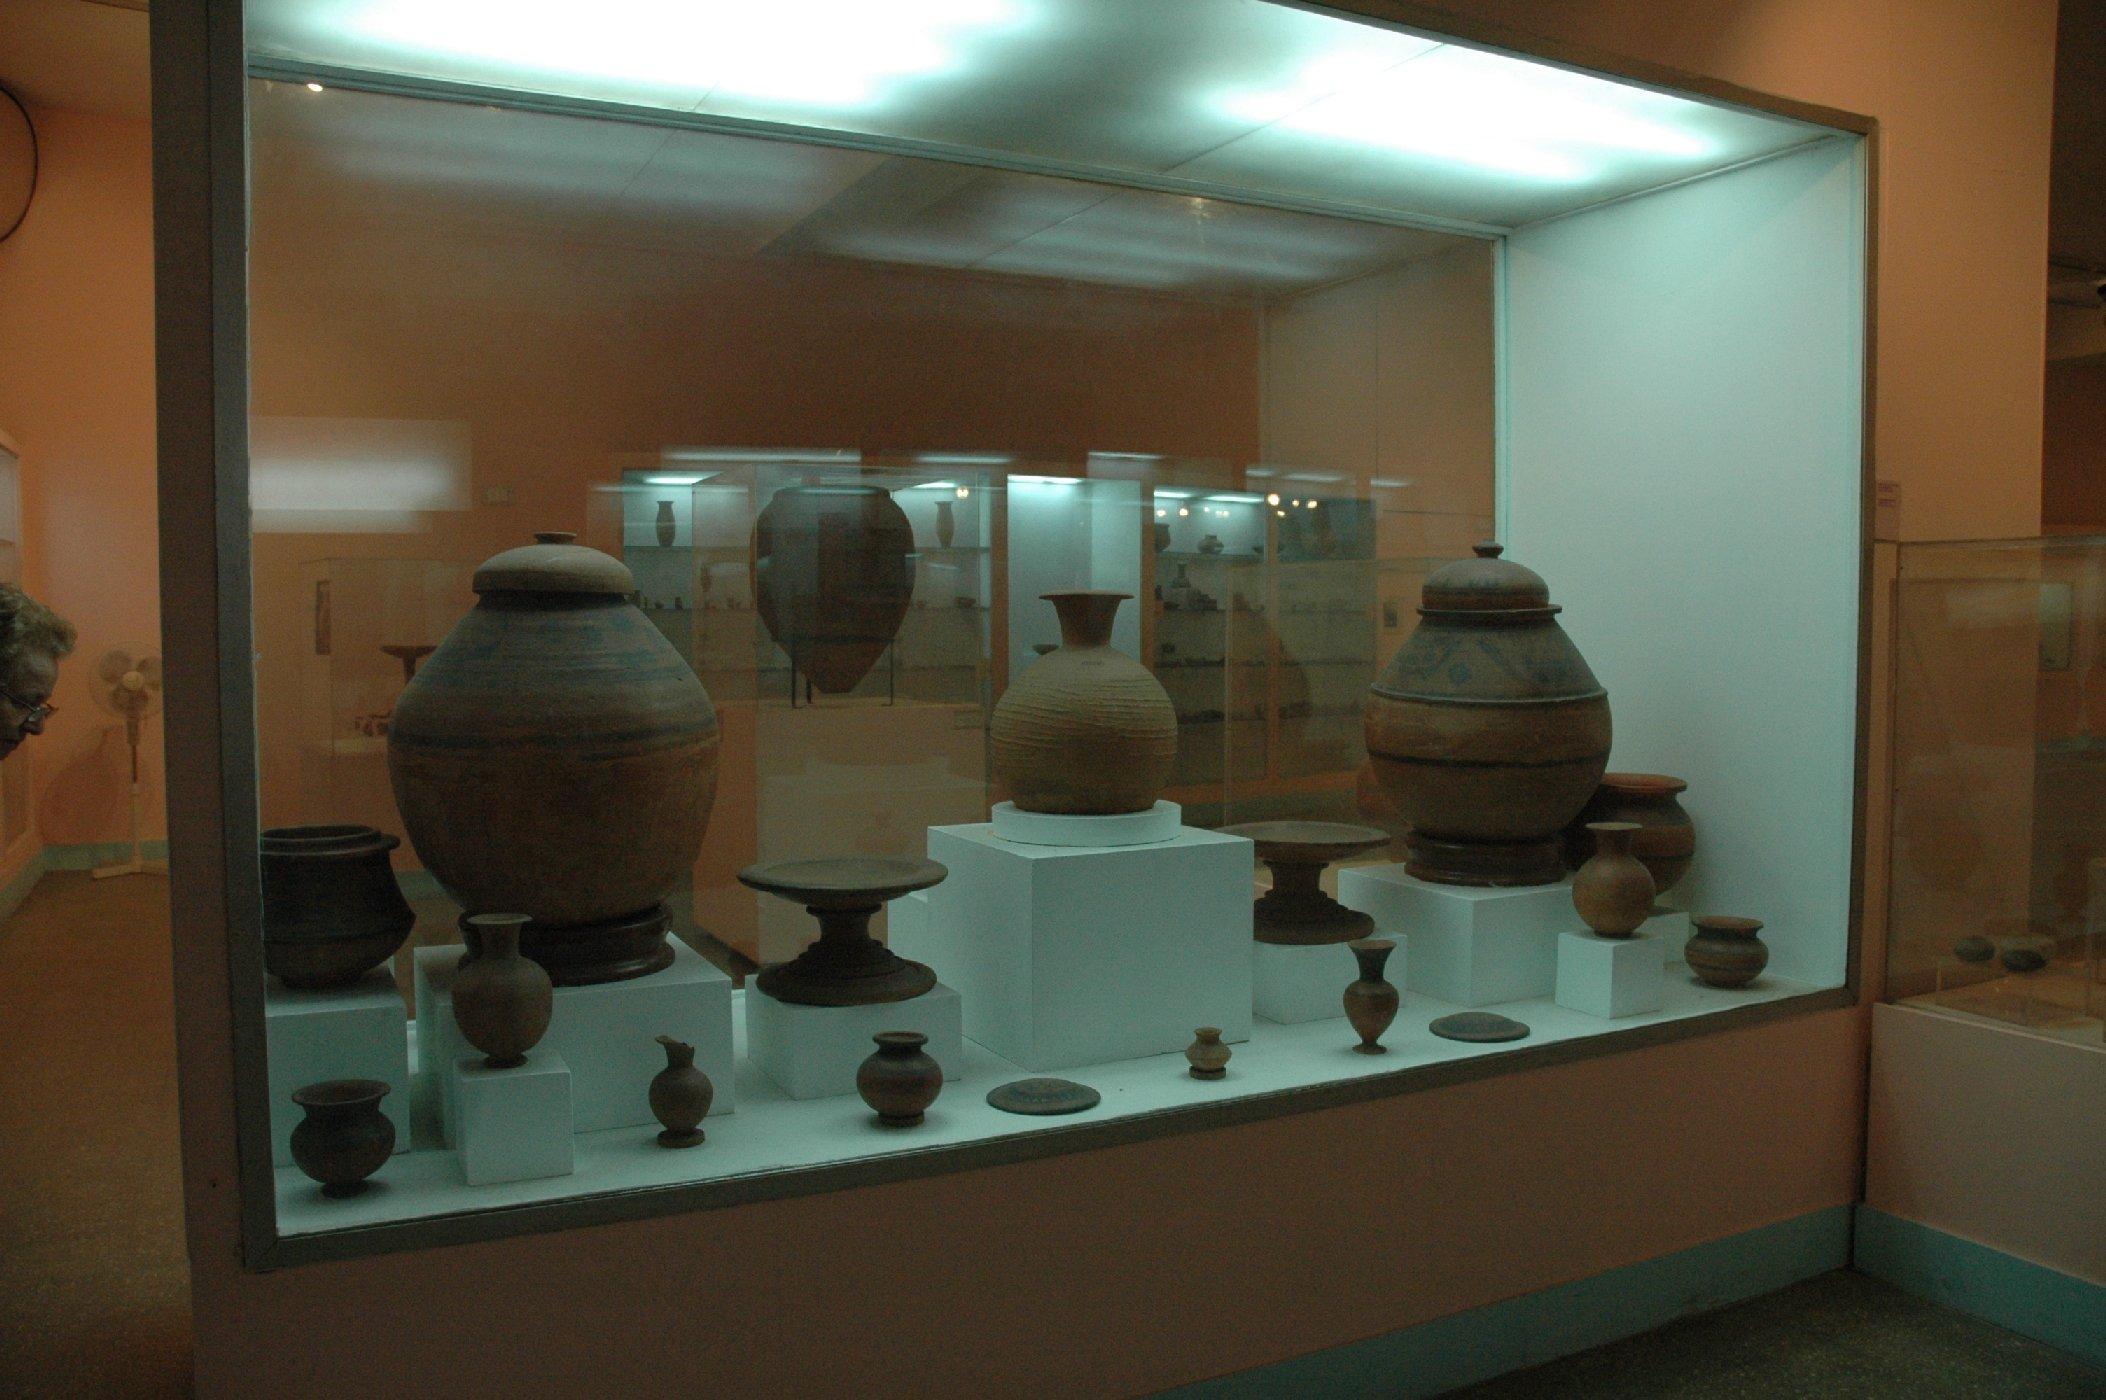 More Harappan Pottery